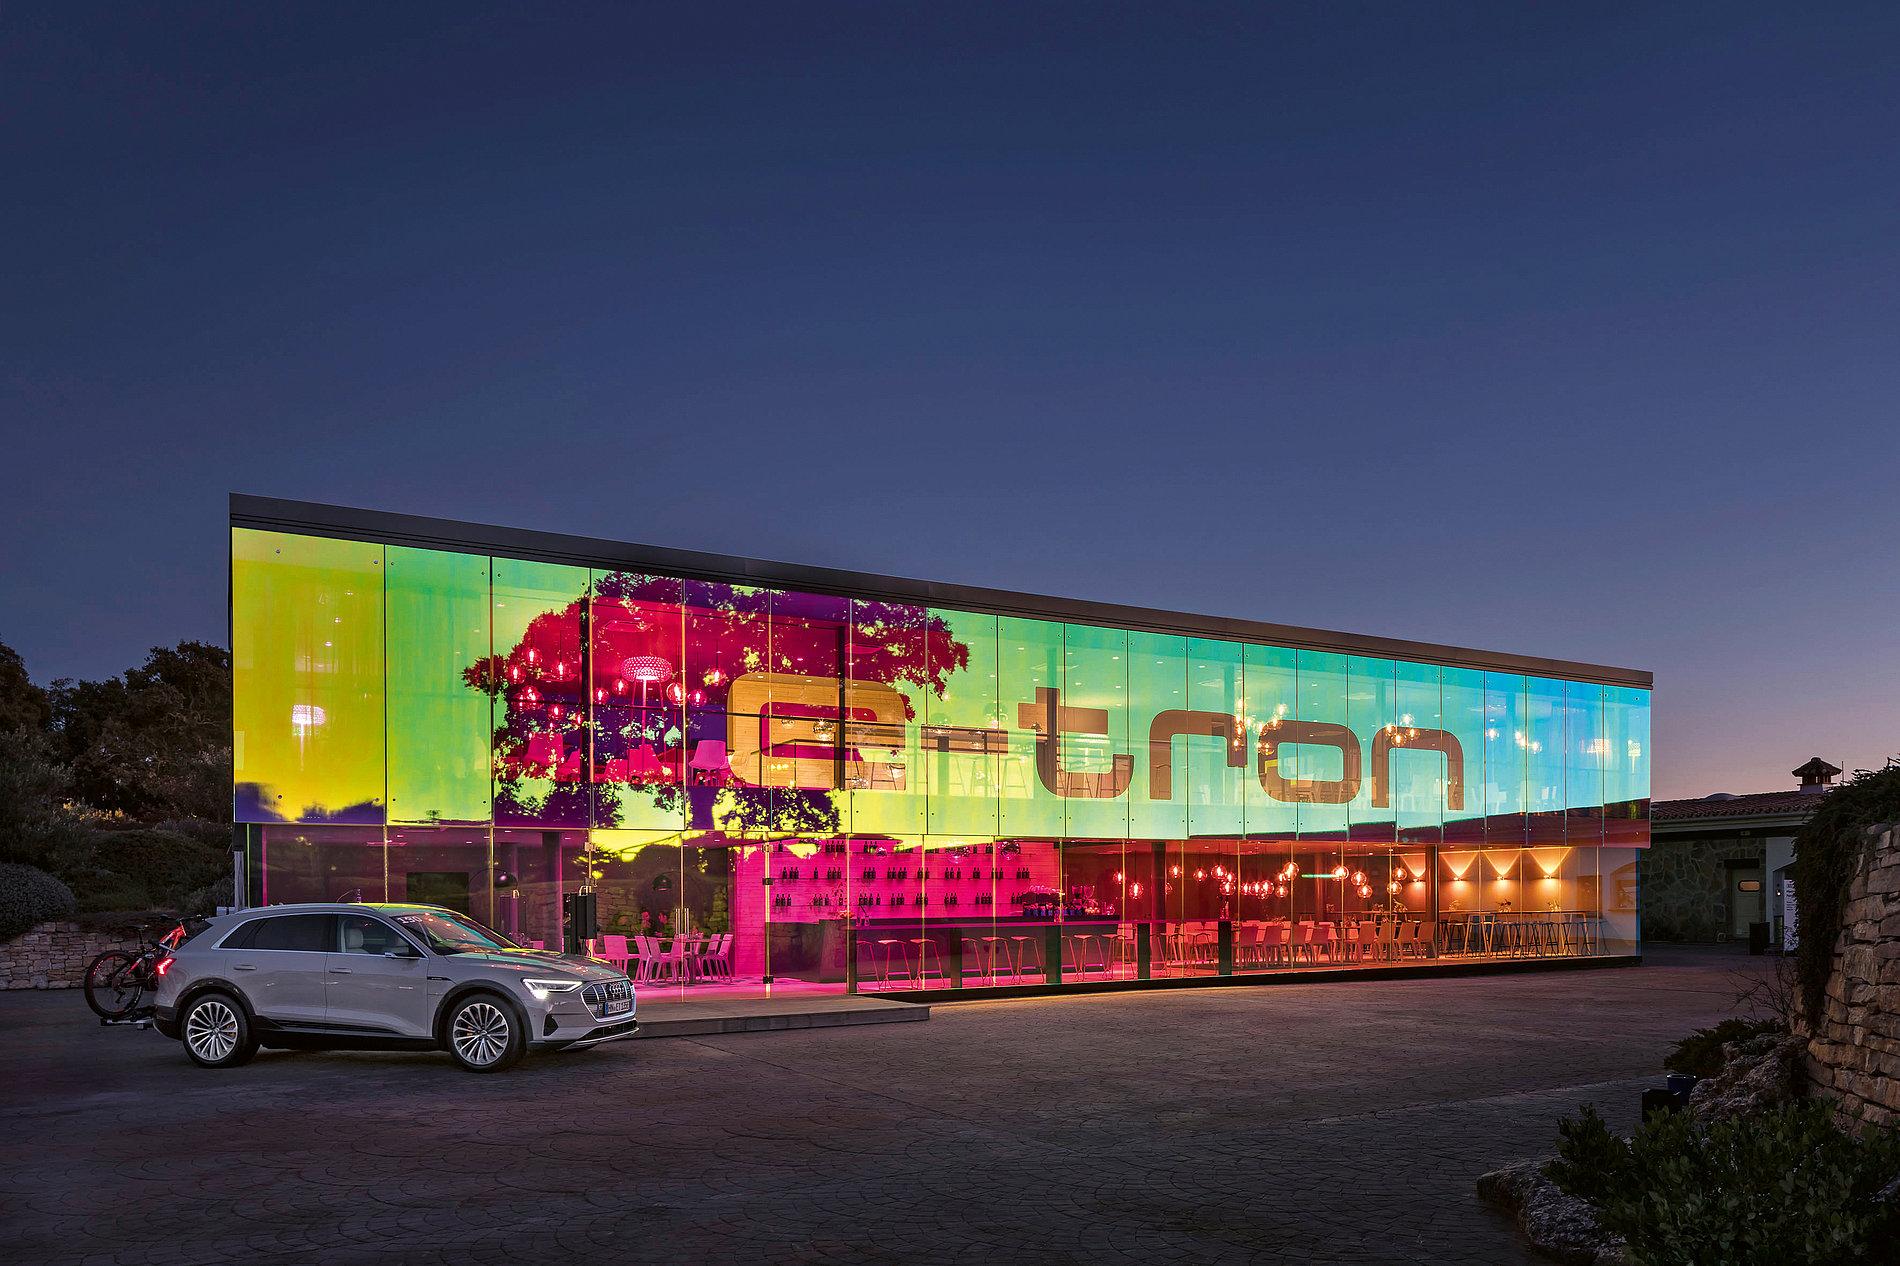 Audi Dealer Meeting Marbella 2019 | Red Dot Design Award